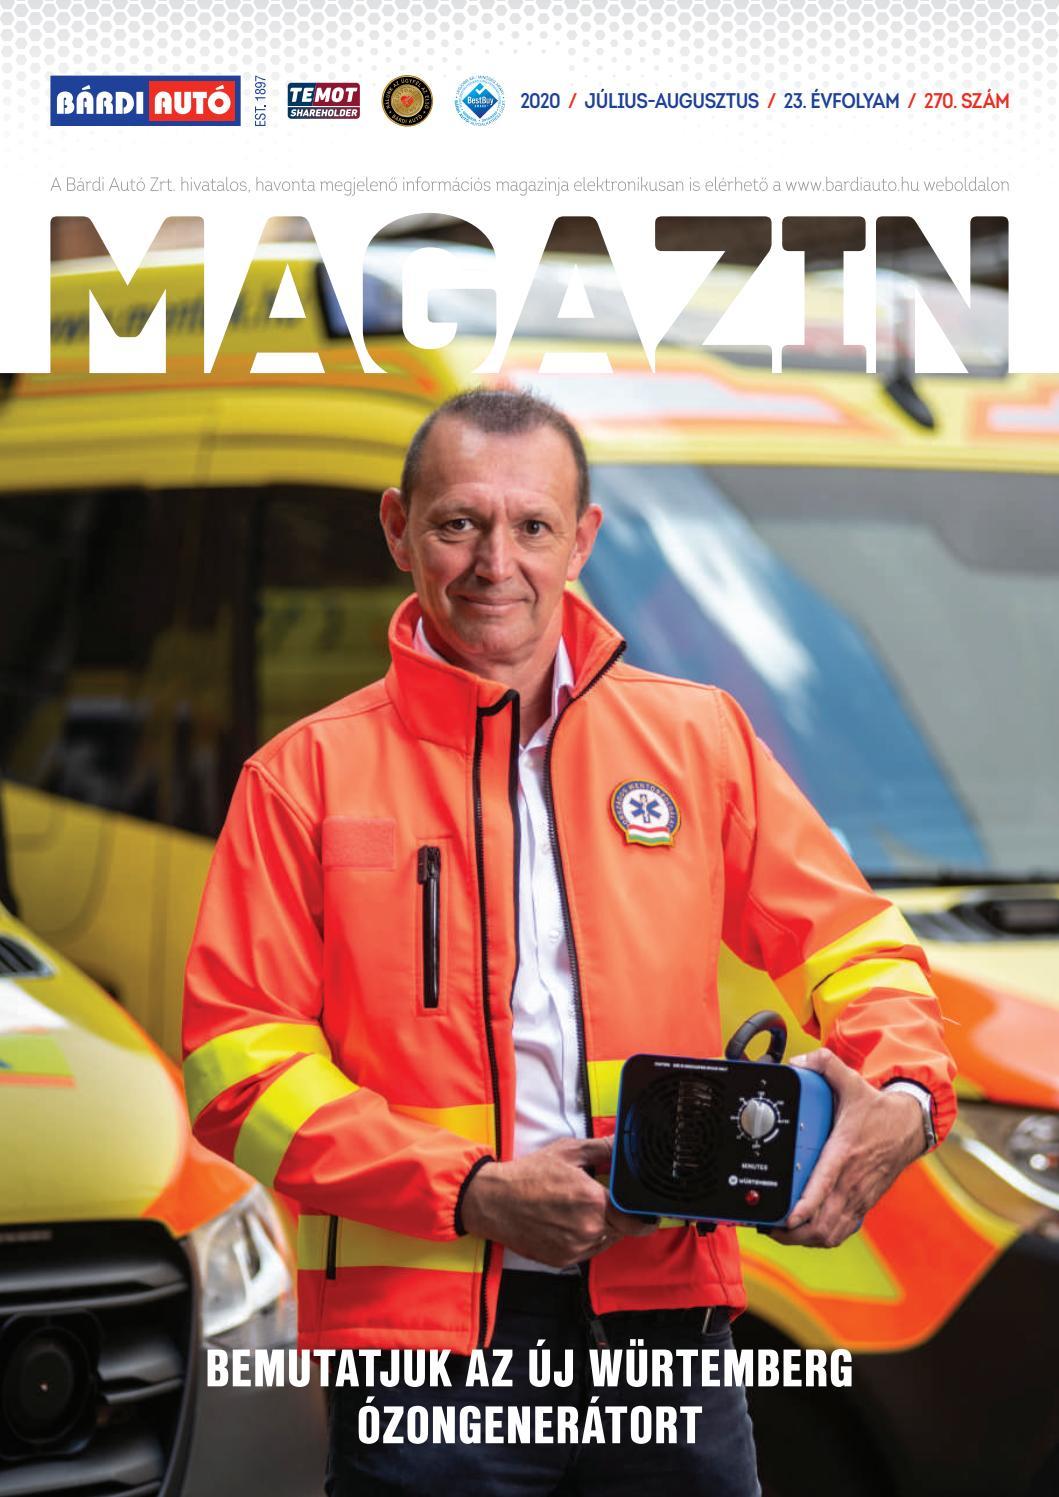 Bardi Auto Magazin Bemutatjuk Az Uj Wurtemberg Ozongeneratort By Bardiauto Issuu